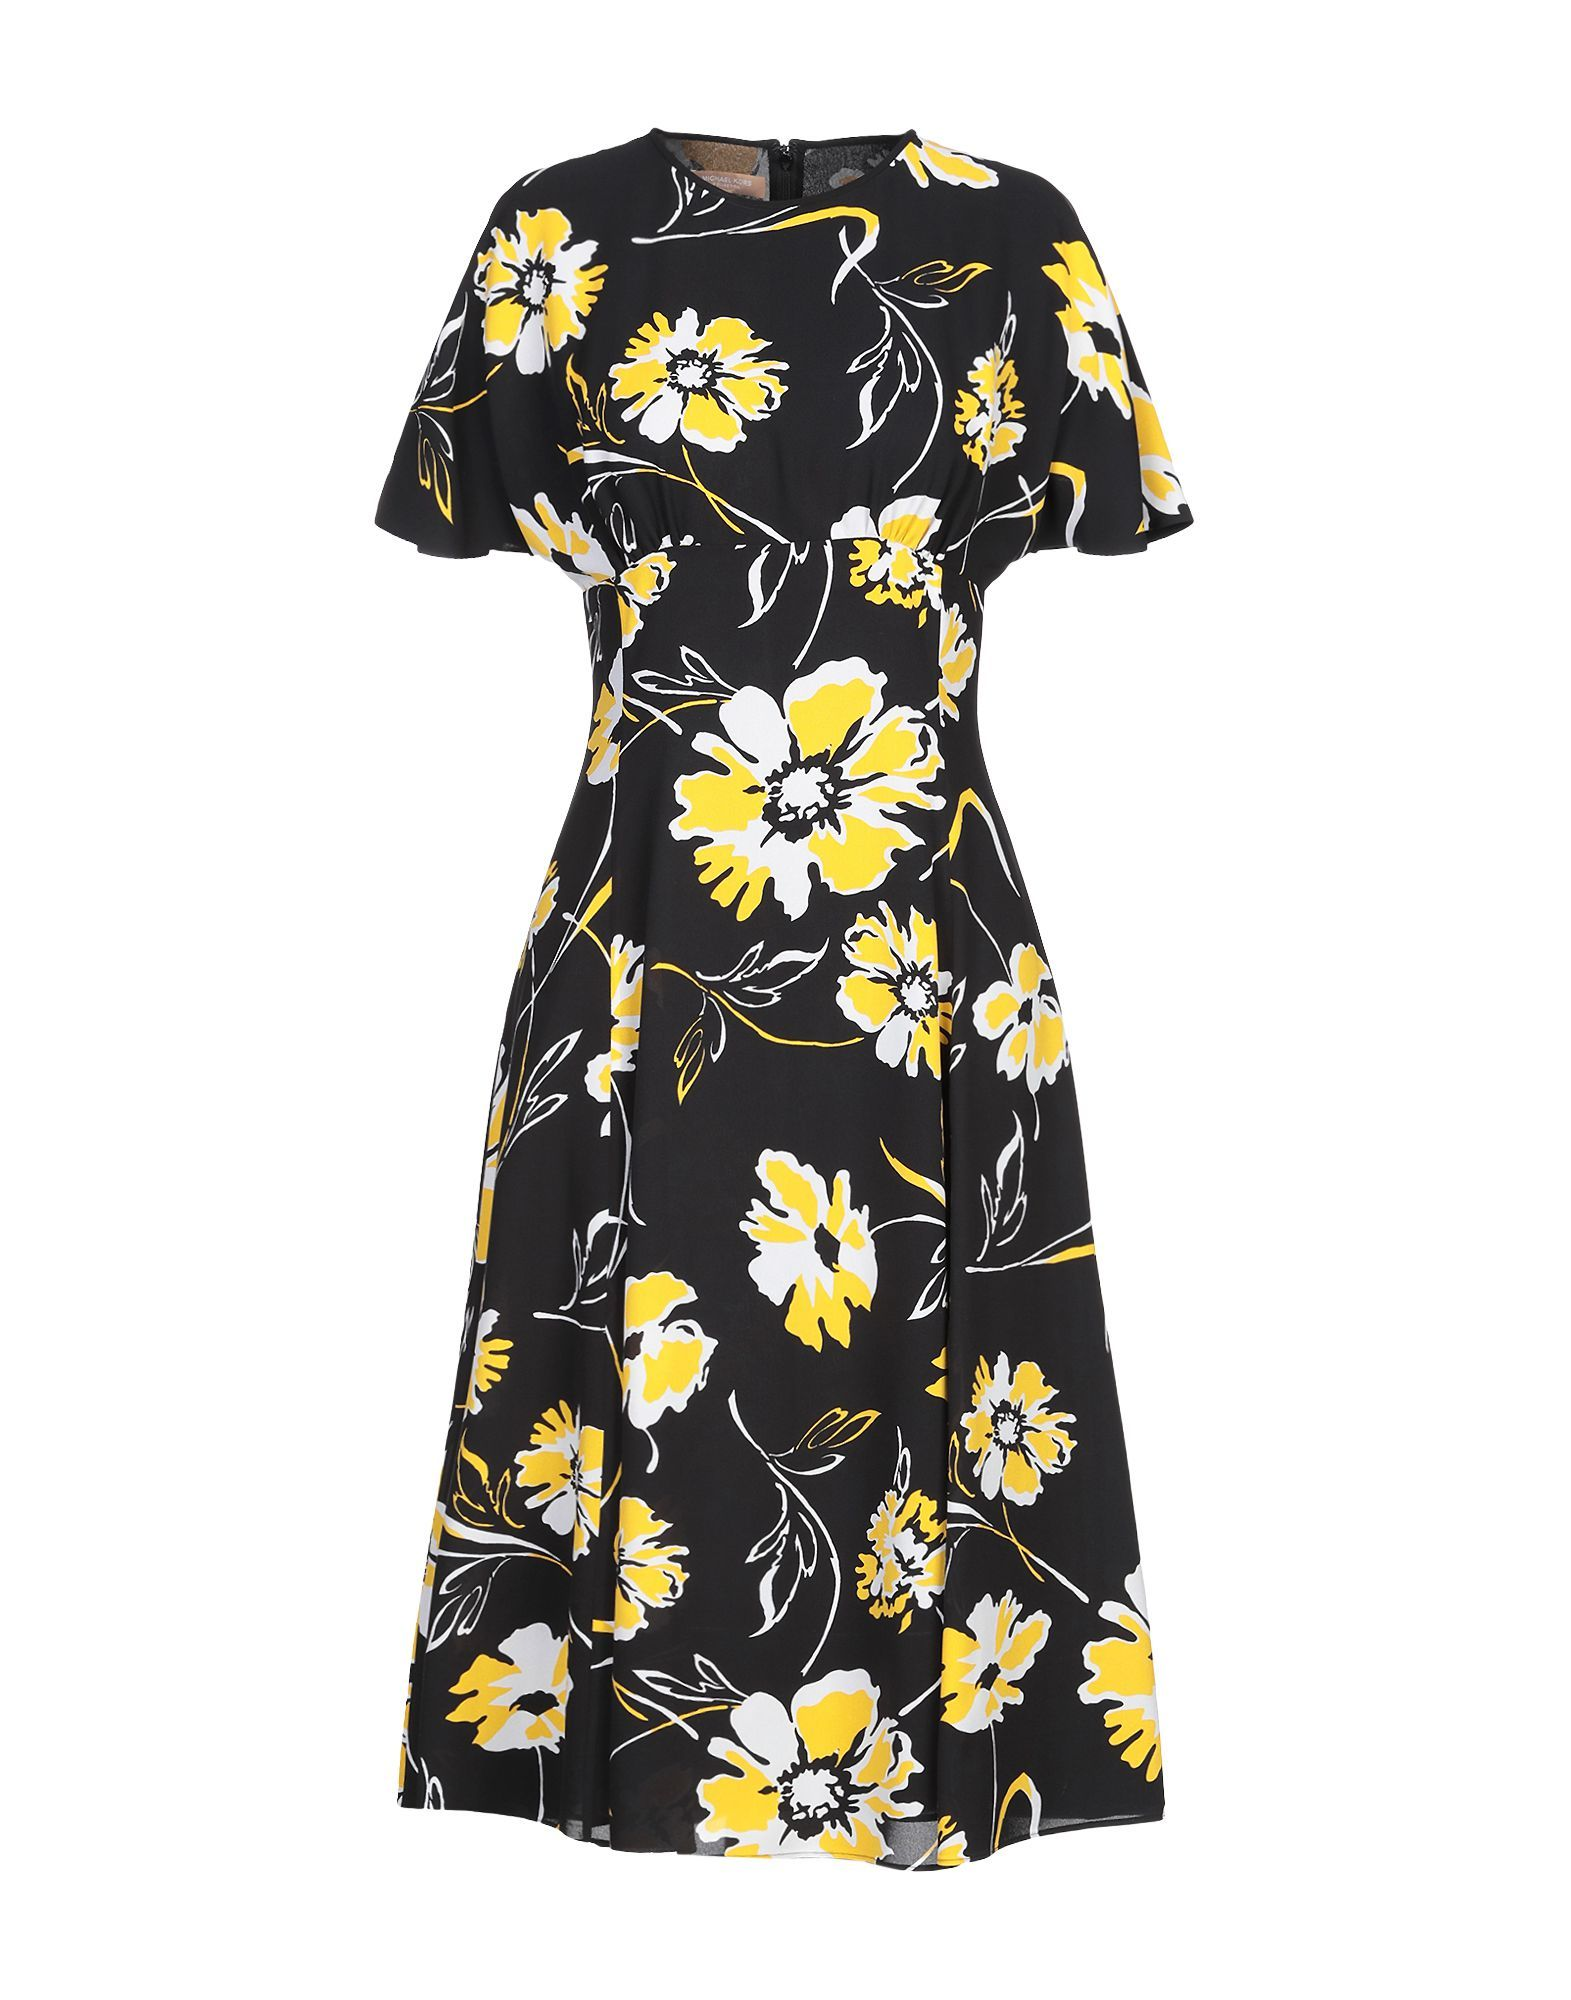 Dress Michael Kors Collection Black Women's Silk